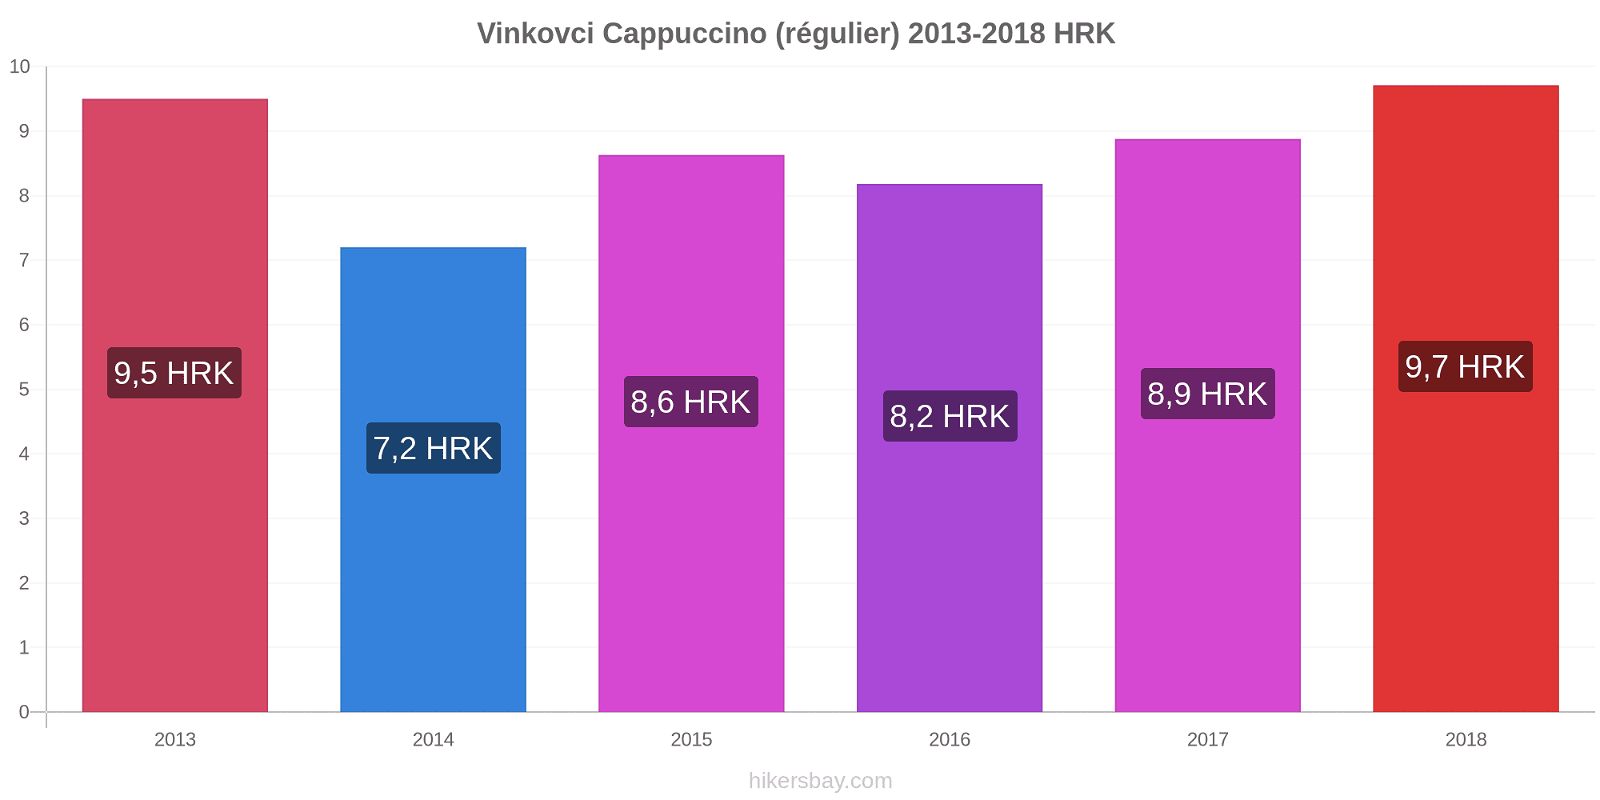 Vinkovci changements de prix Cappuccino (régulier) hikersbay.com